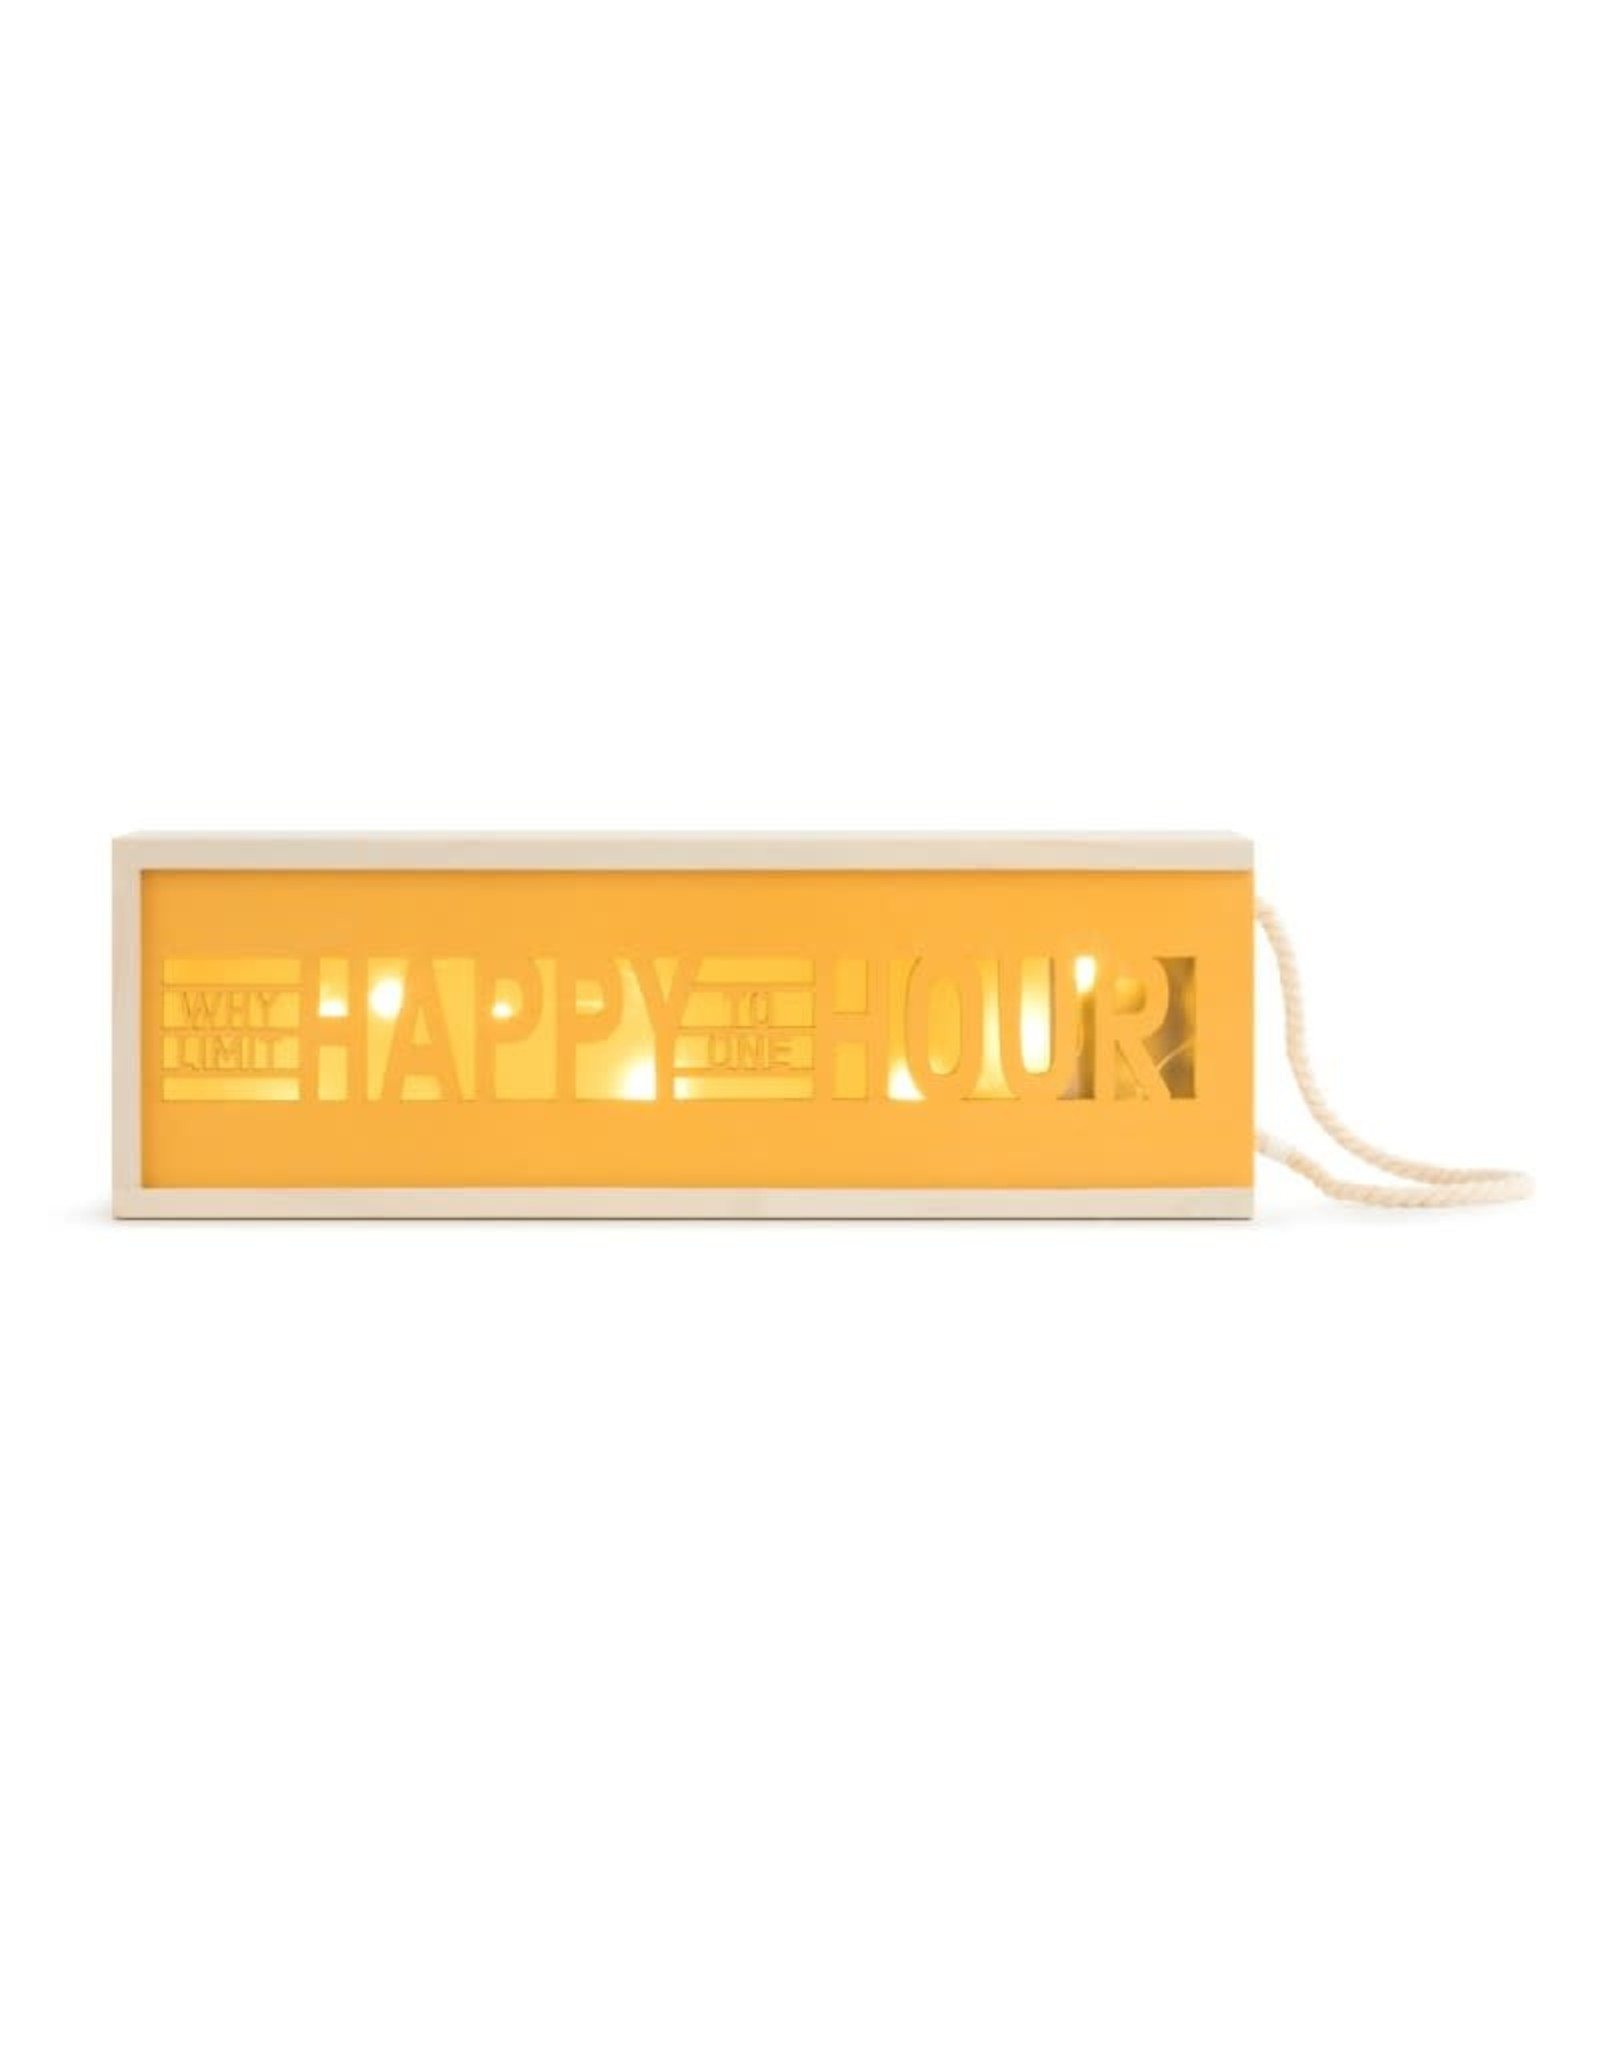 Wine Lantern - Why Limit Happy